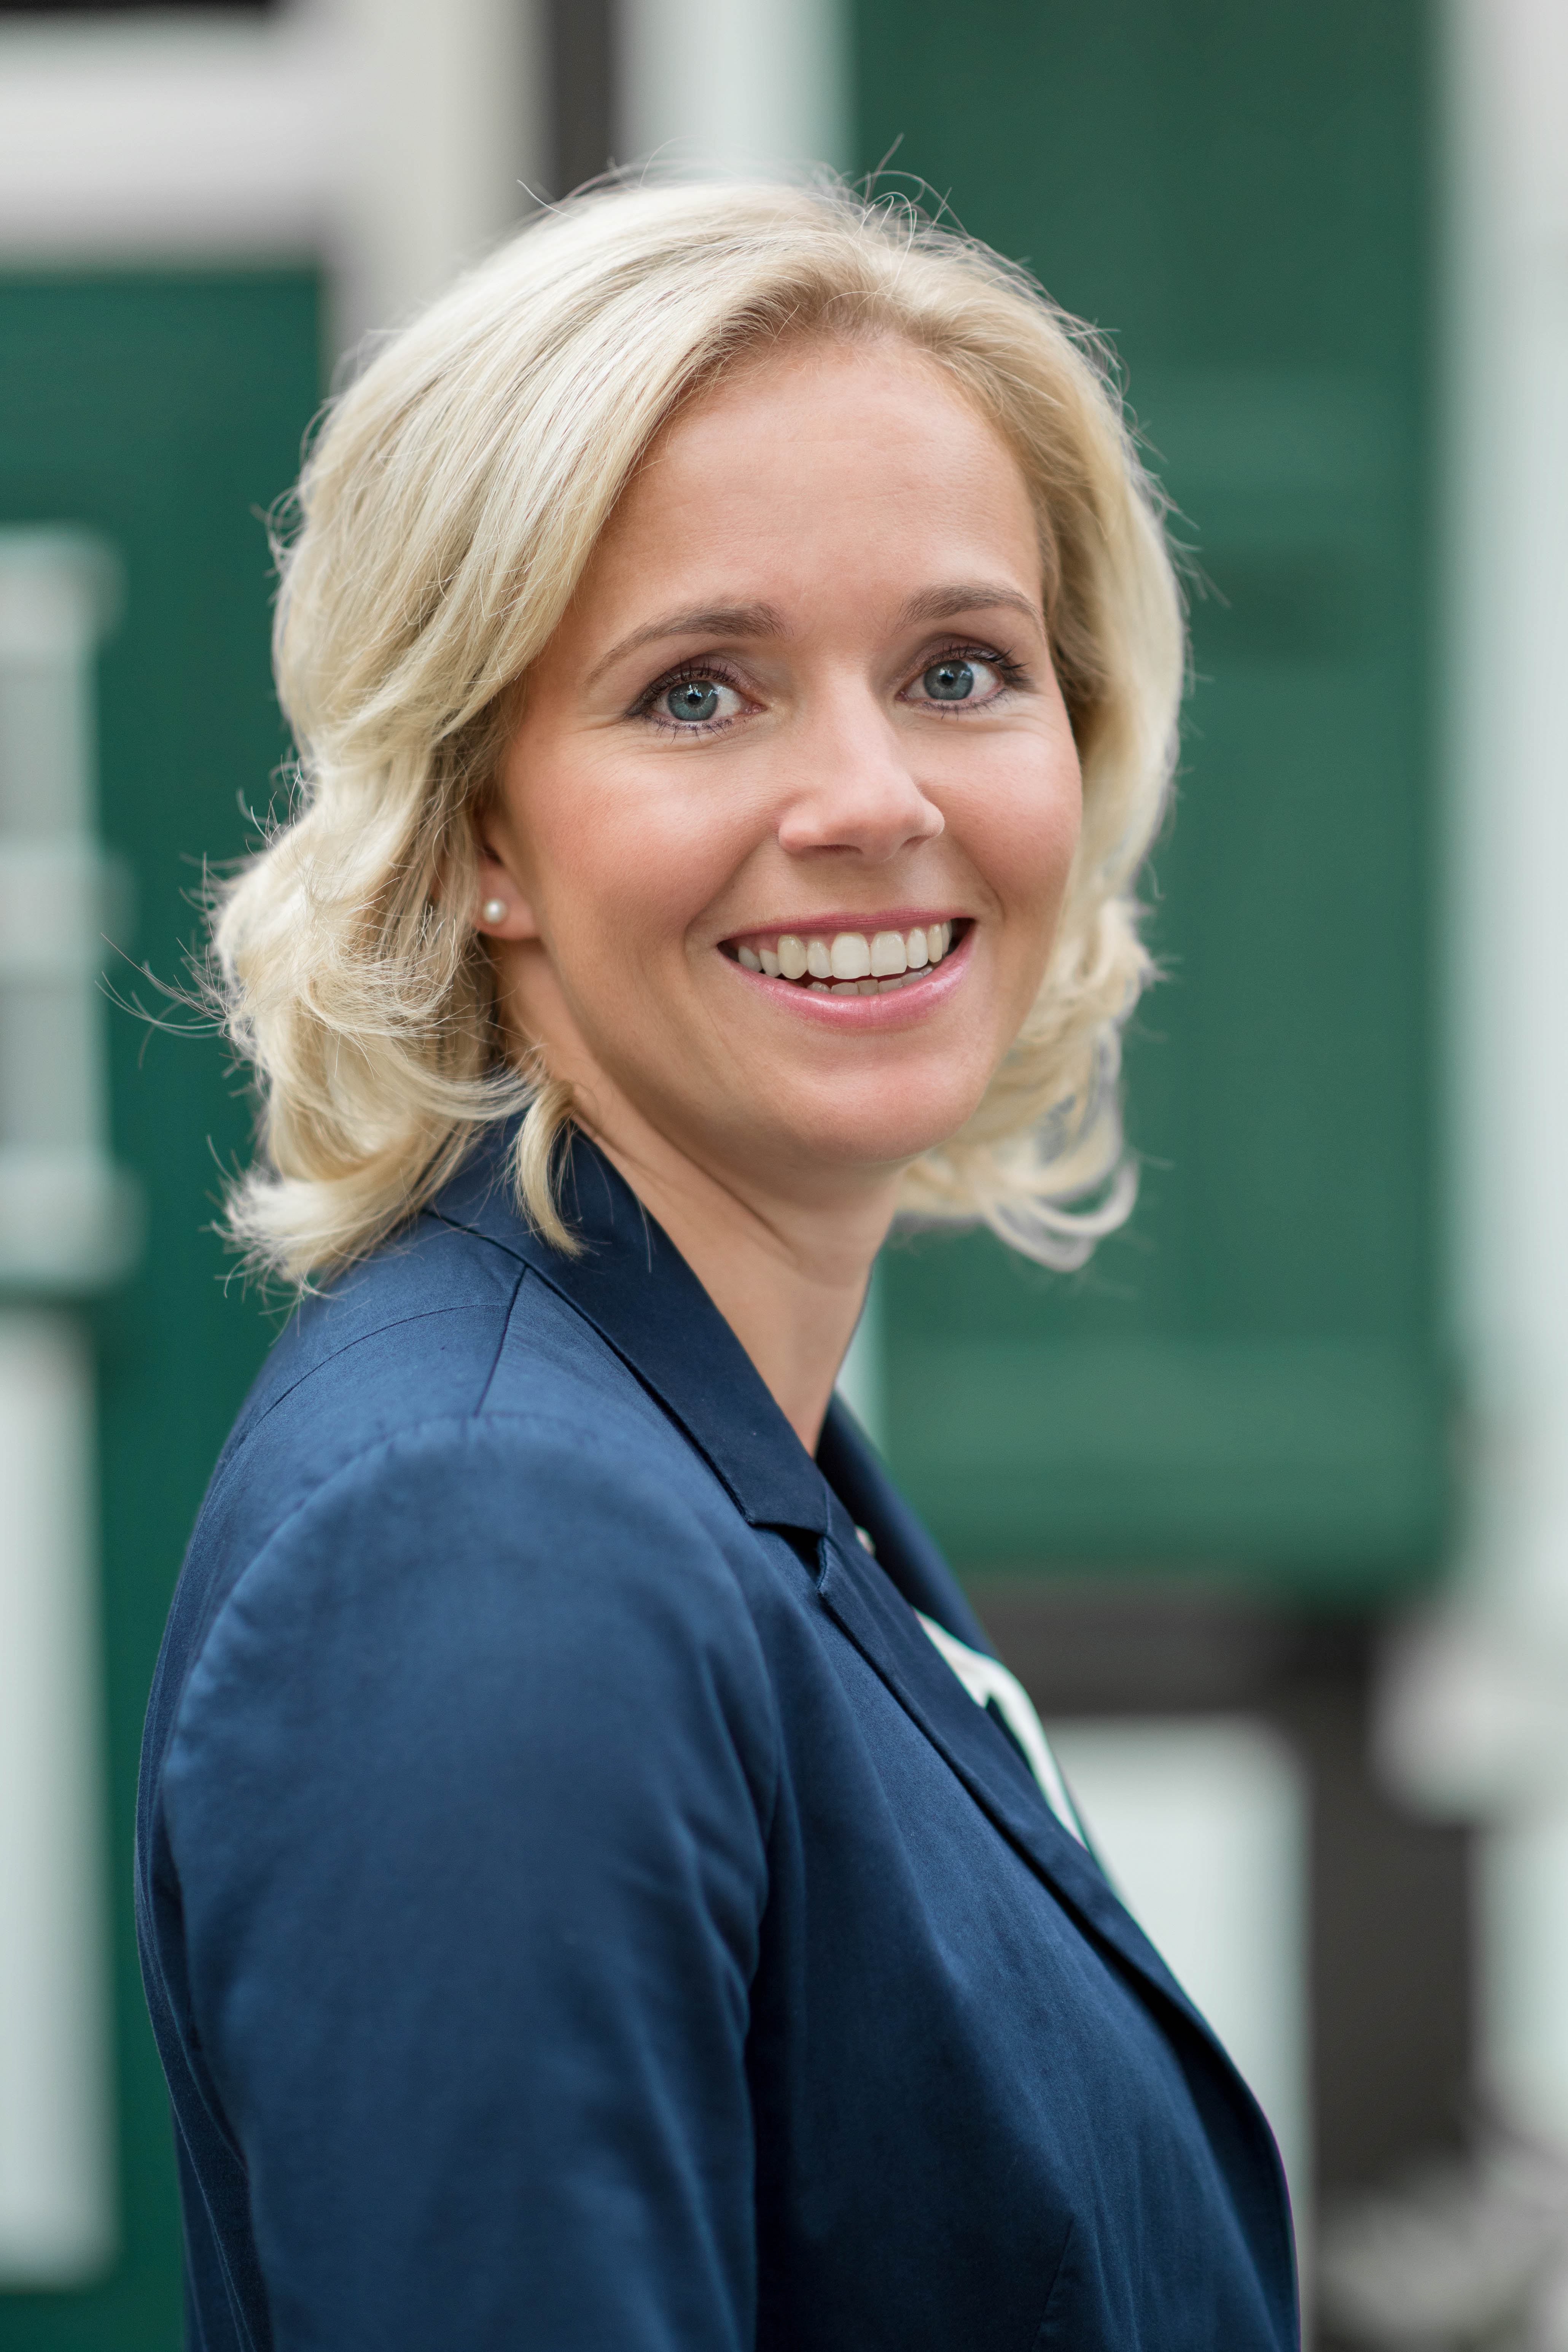 Kommunalpolitikerinnen im Fokus - Christina Rählmann